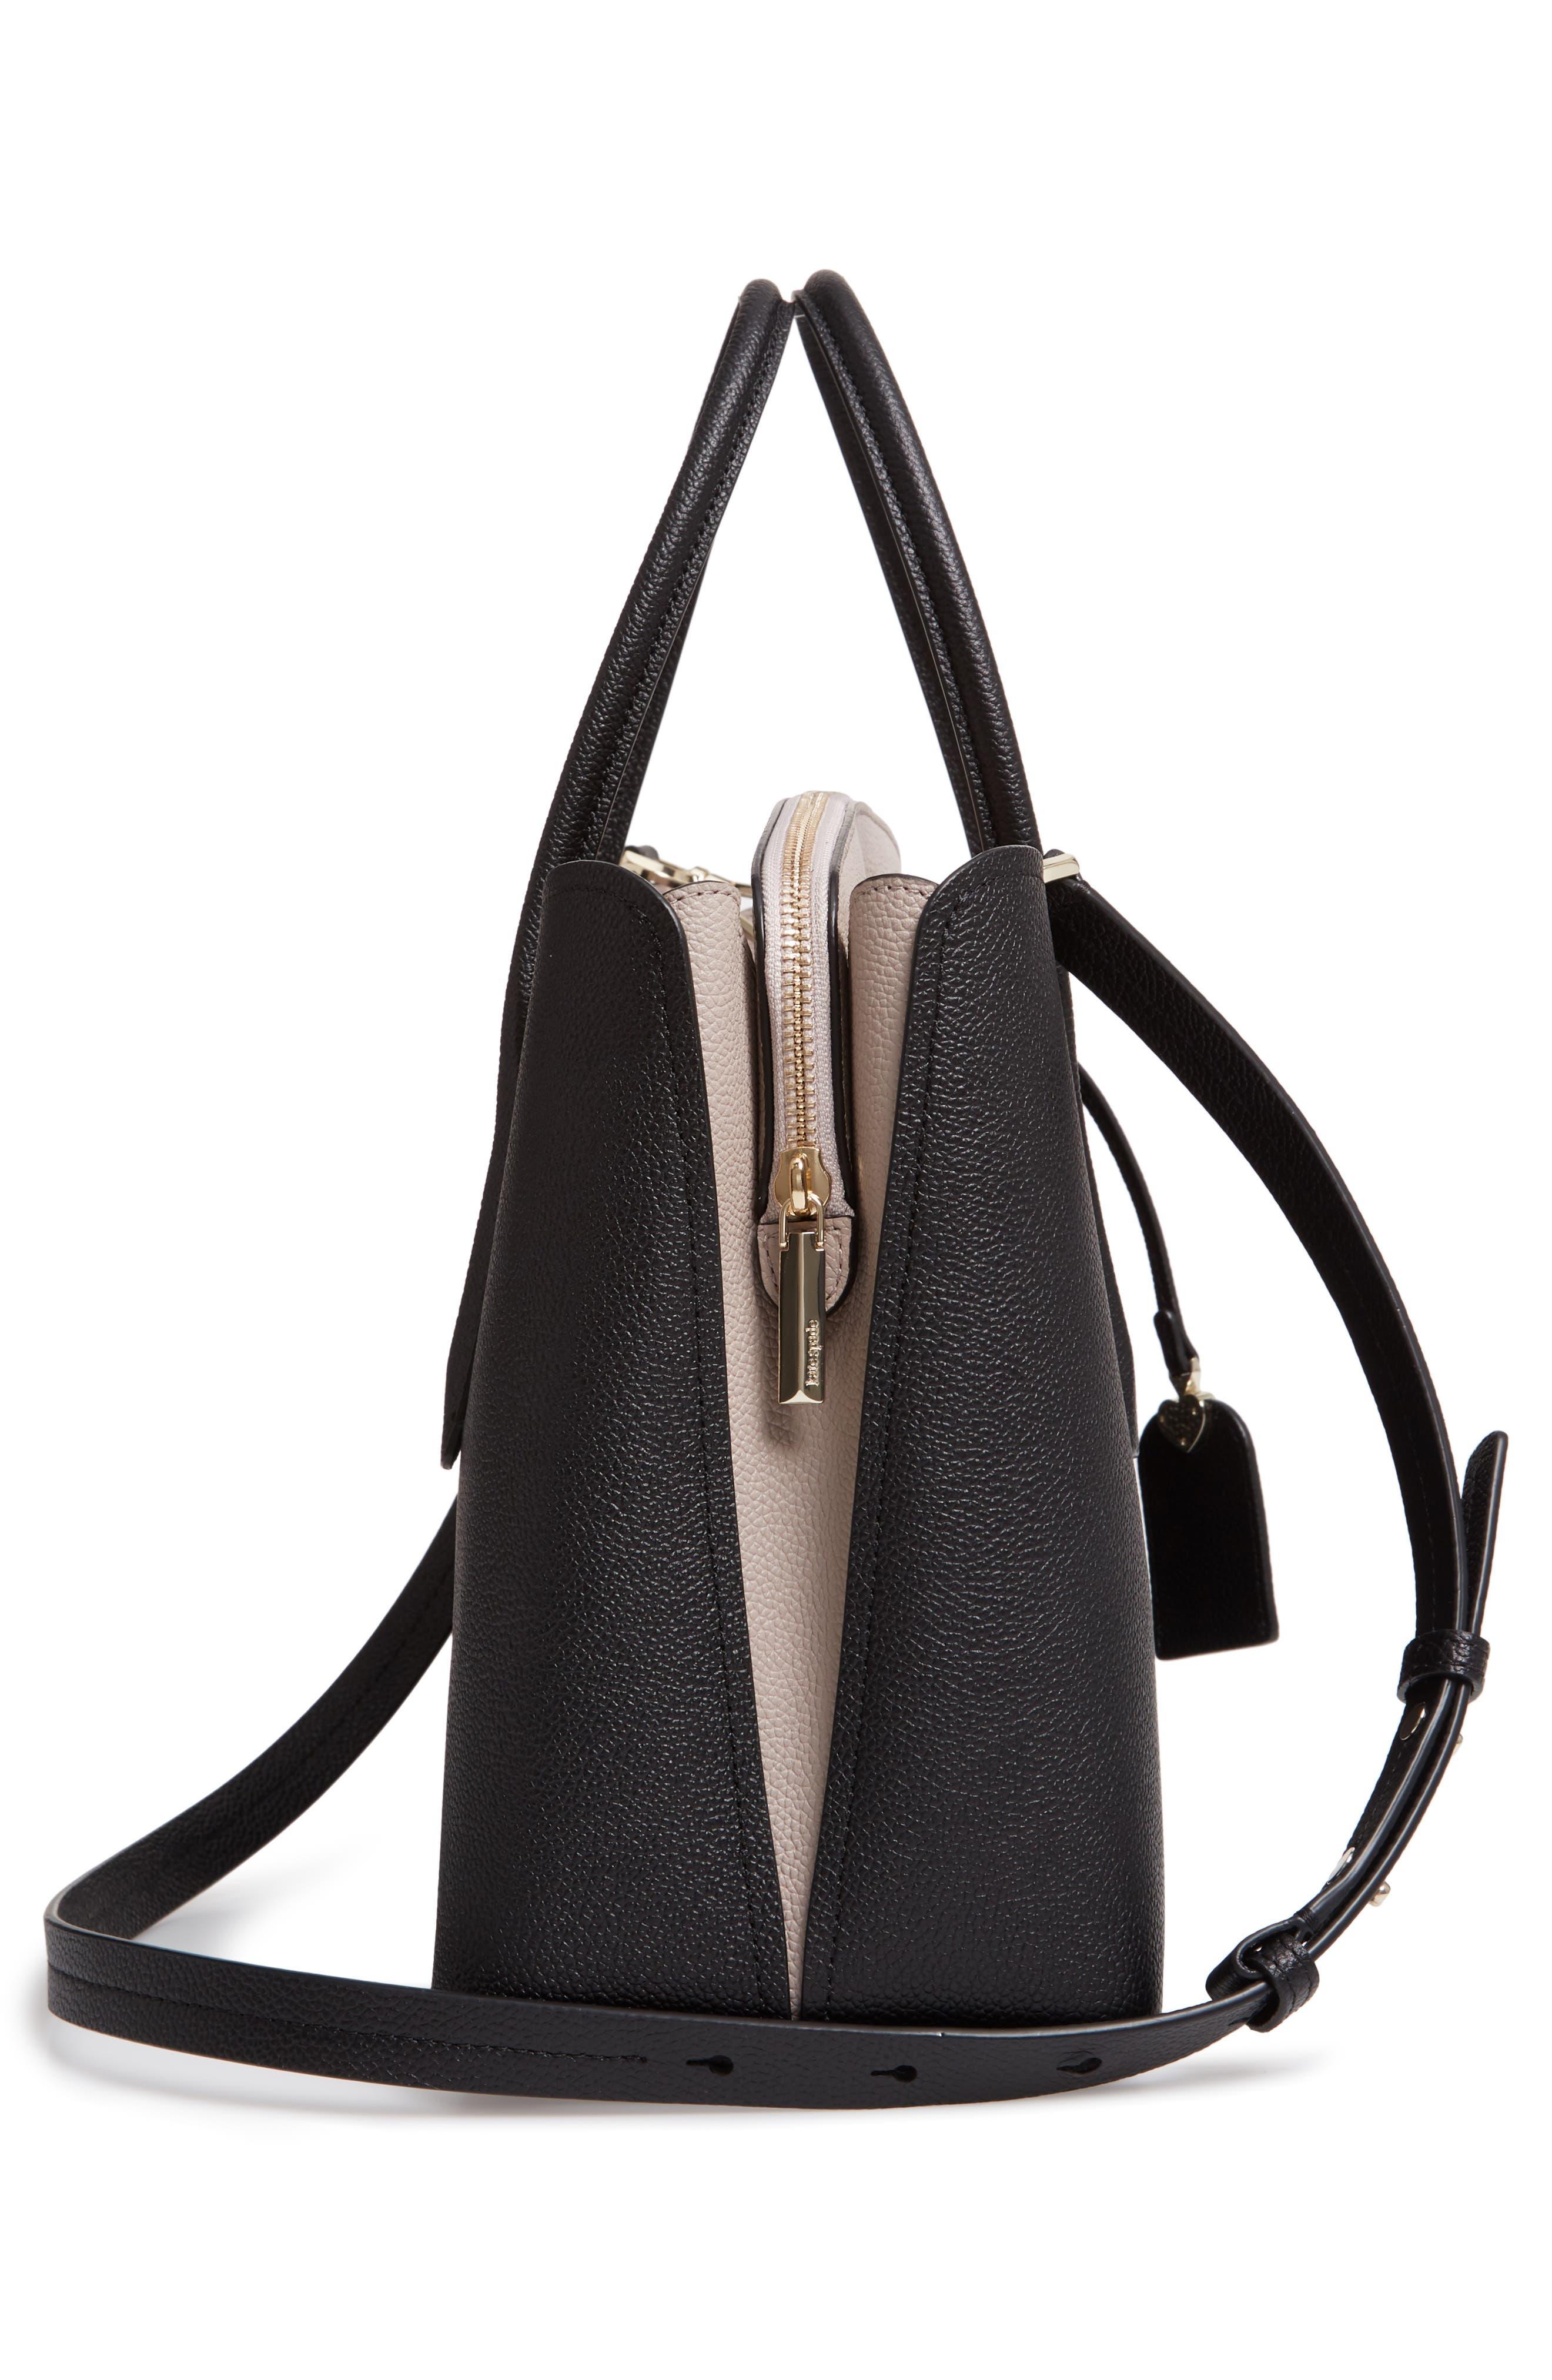 KATE SPADE NEW YORK, large margaux leather satchel, Alternate thumbnail 6, color, BLACK/ WARM TAUPE